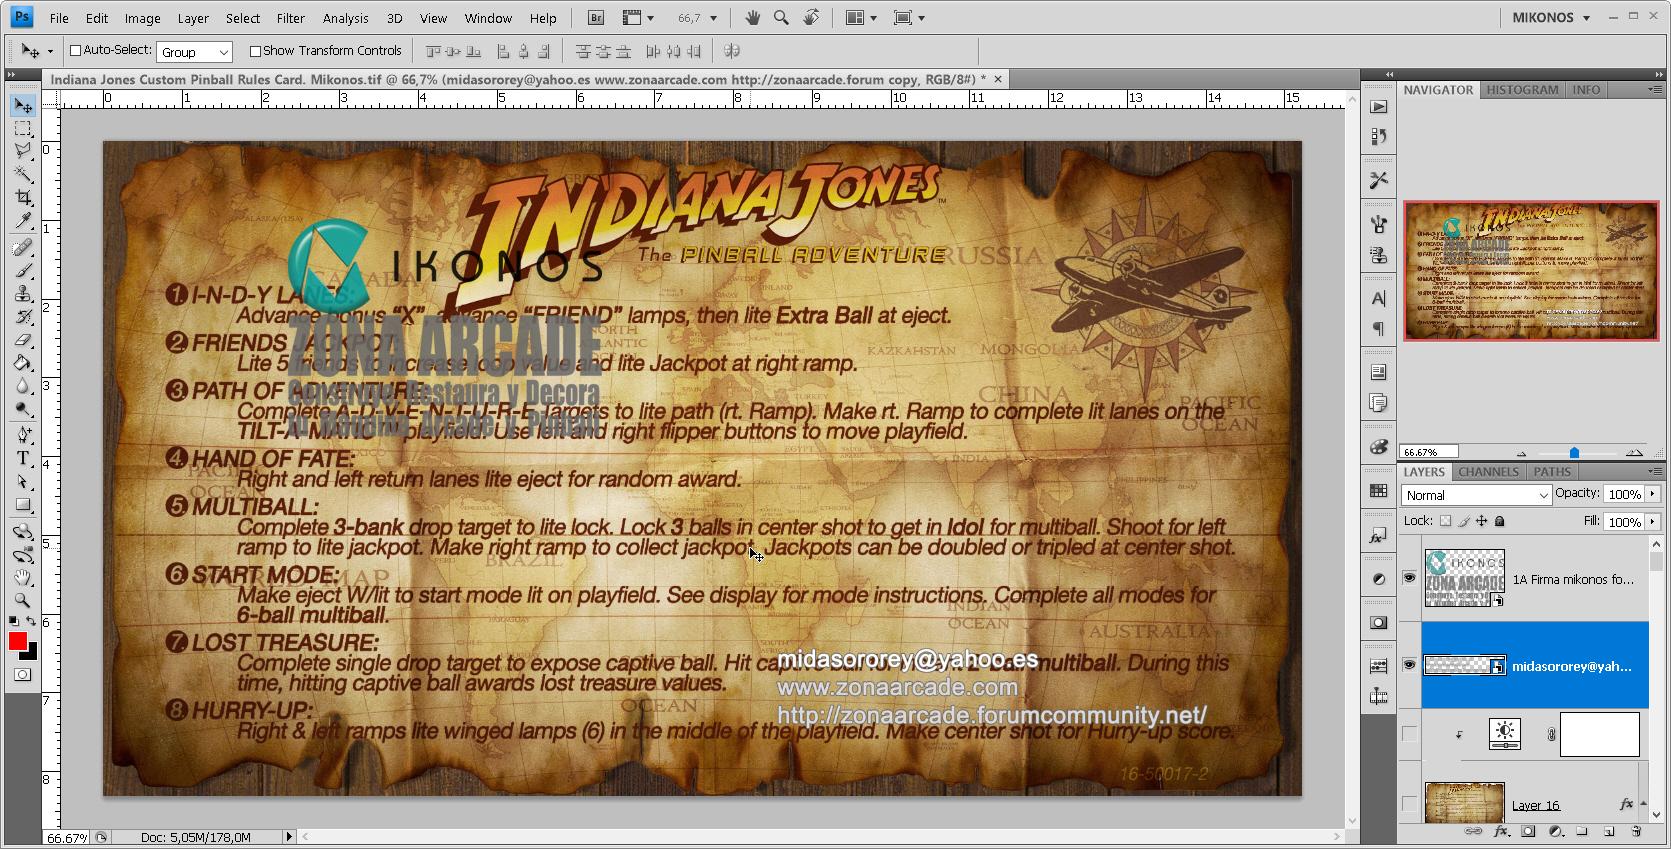 Indiana-Jones-Custom-Pinball-Card-Rules-Mikonos1